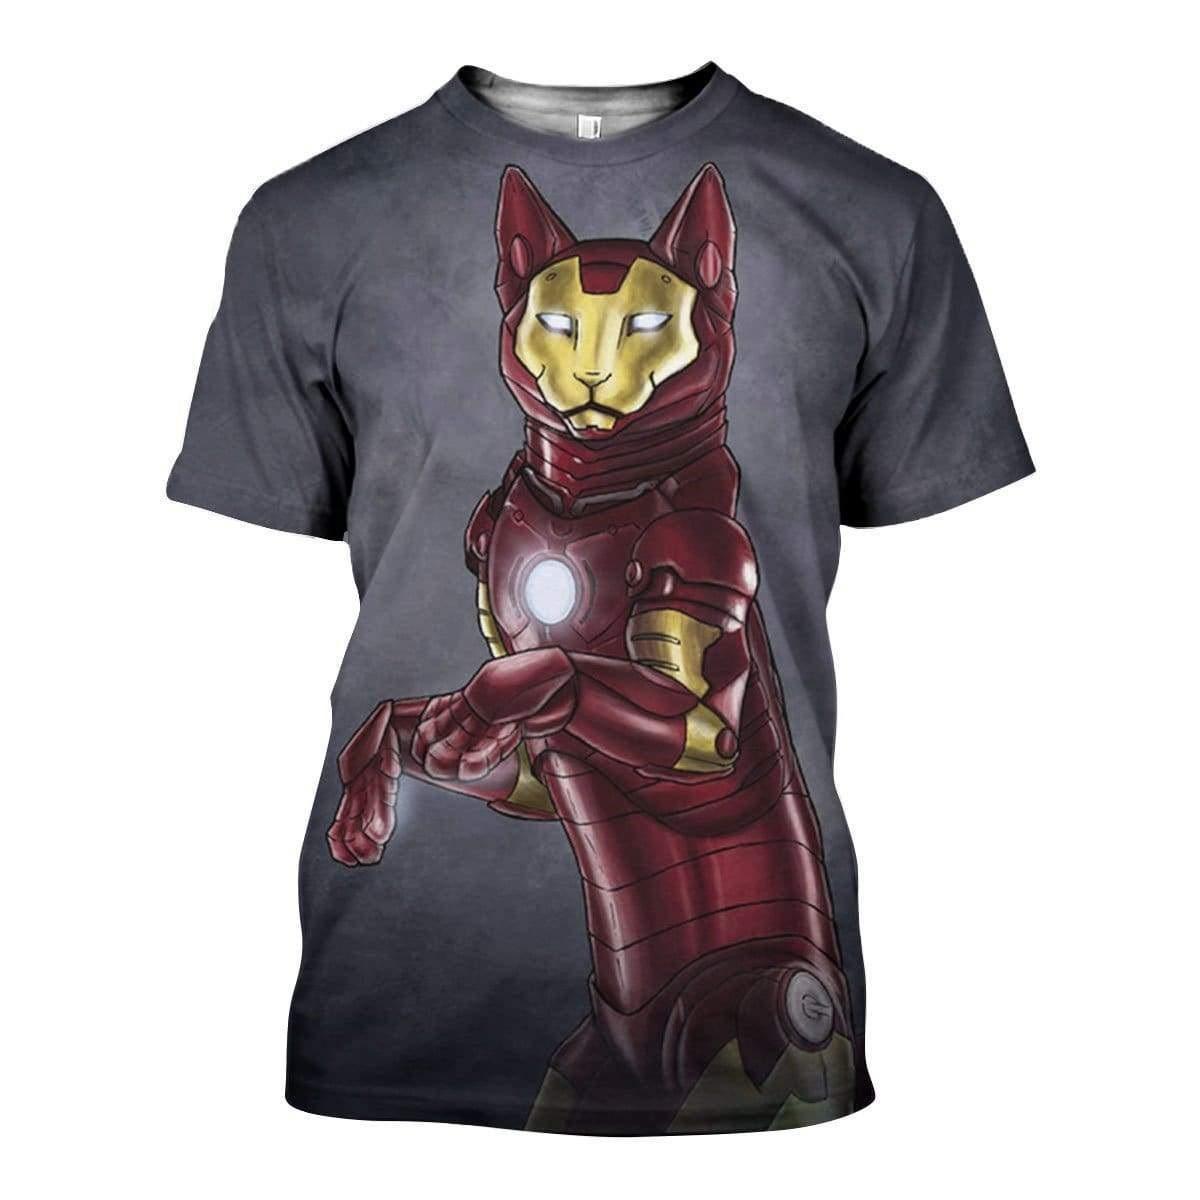 Avengers iron man iron cat all over print tshirt